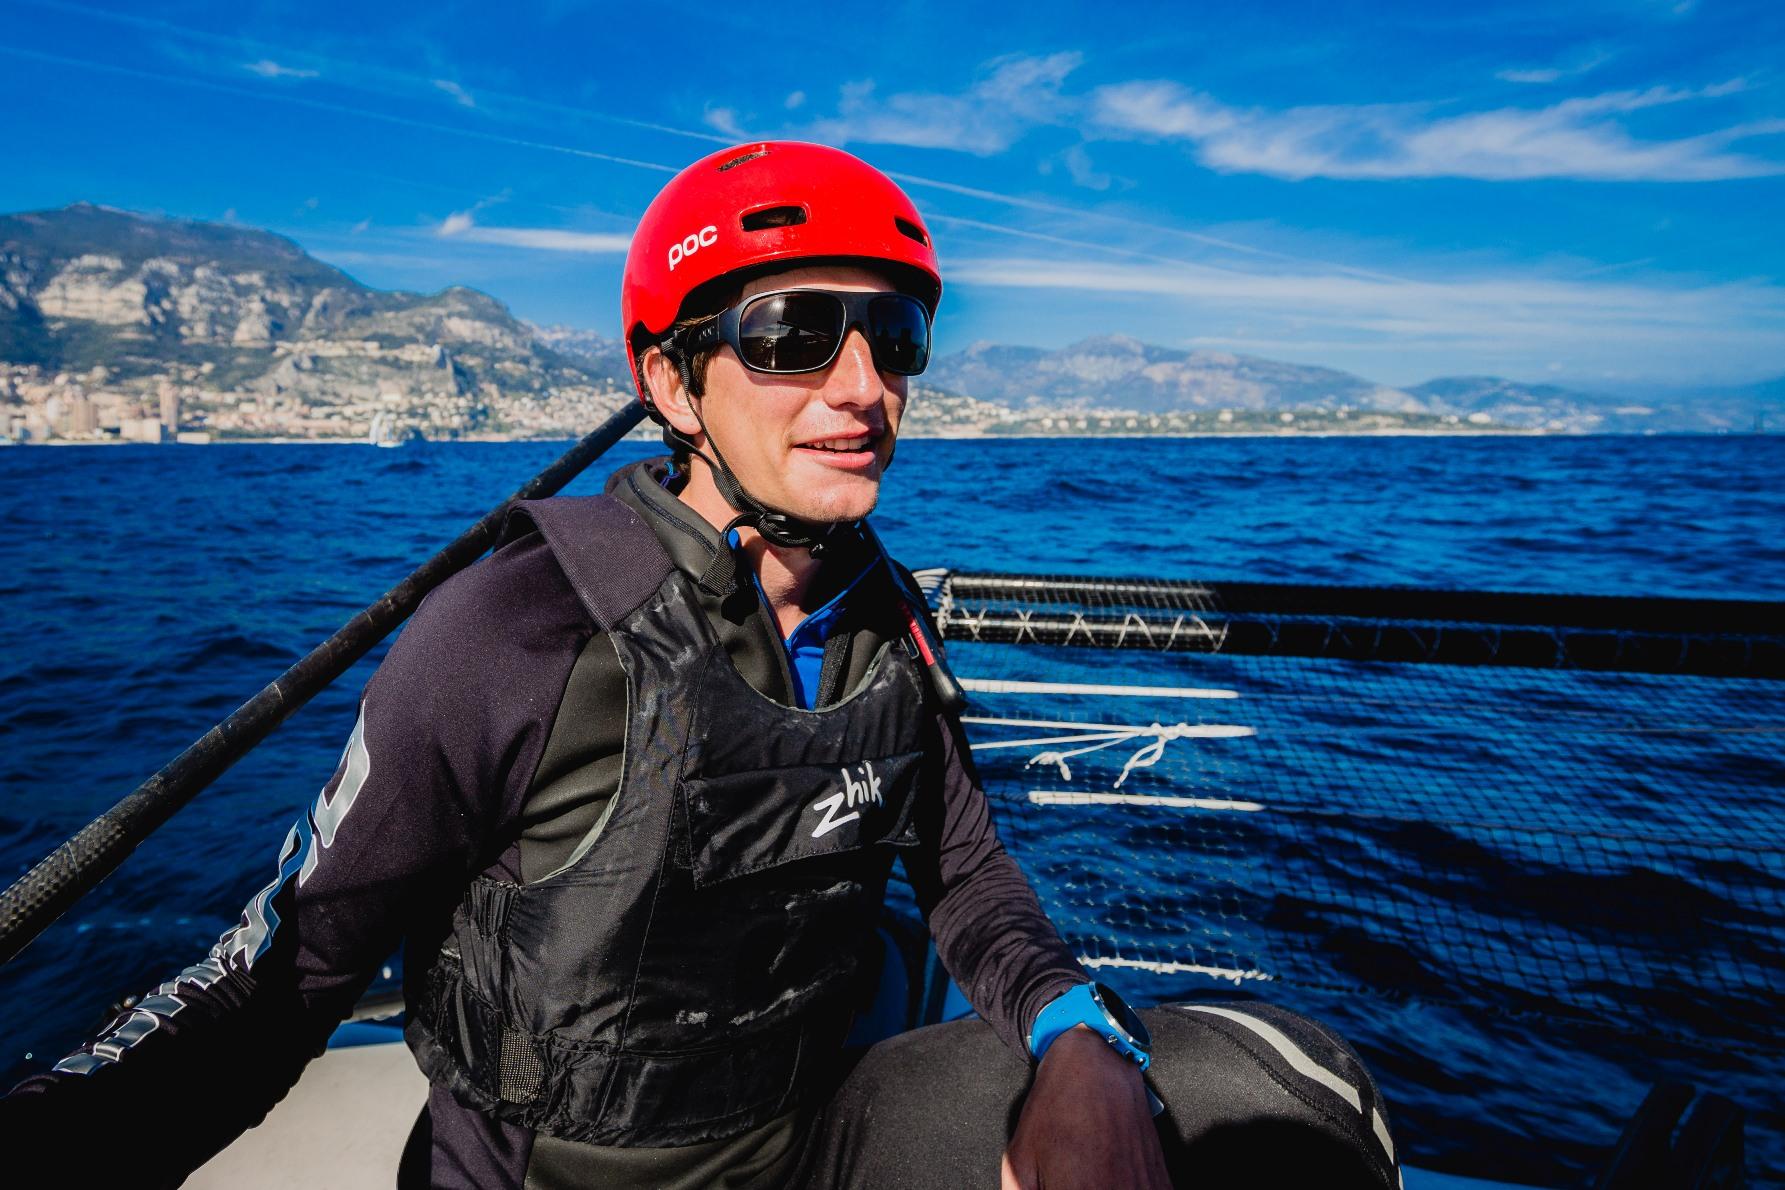 Candidate Sailing Team Steuermann Stefan Scharnagl c_CST dapic.rocks